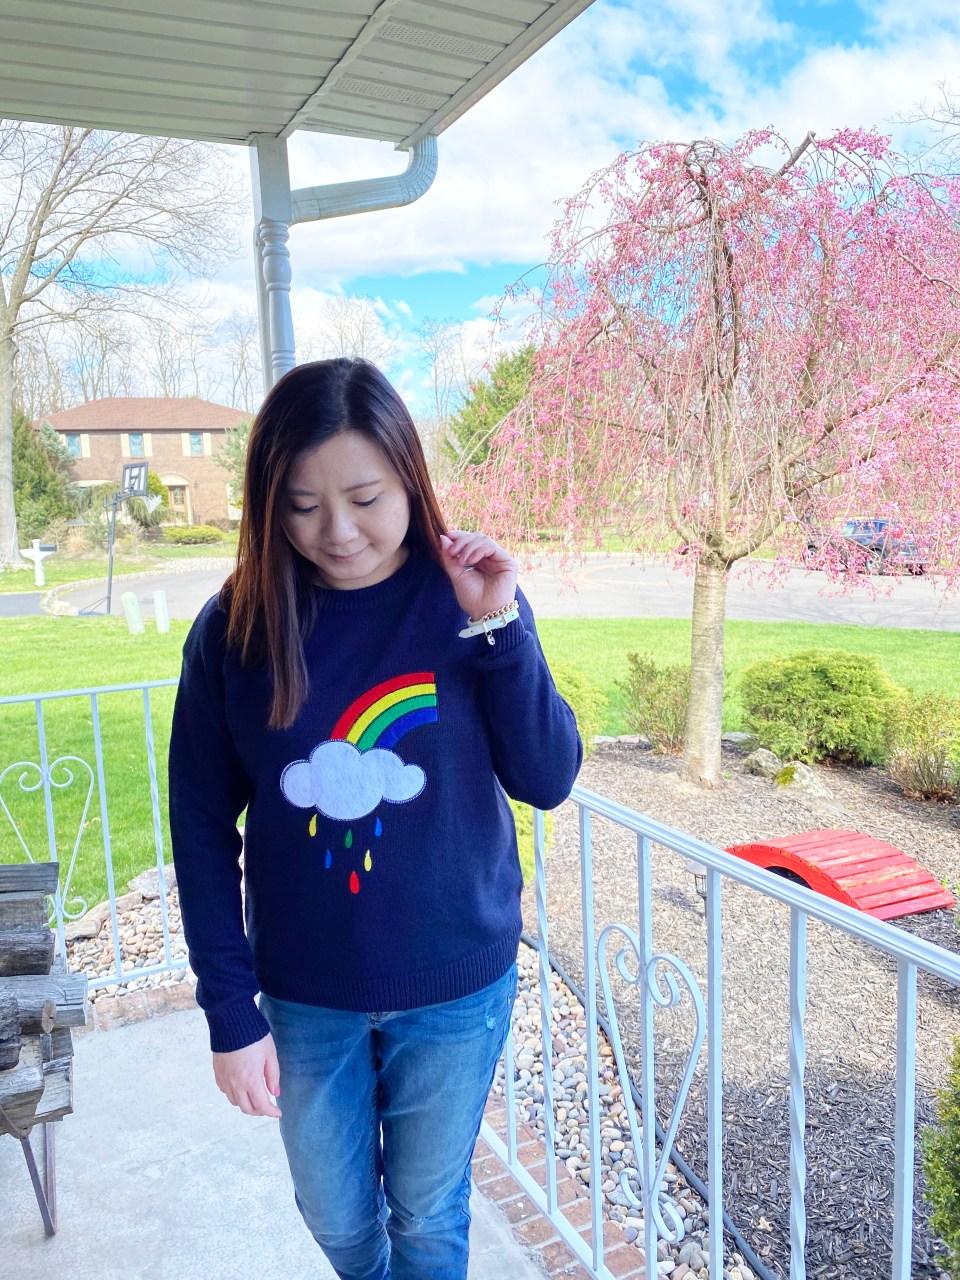 Rainbow & Cloud Sweater 5